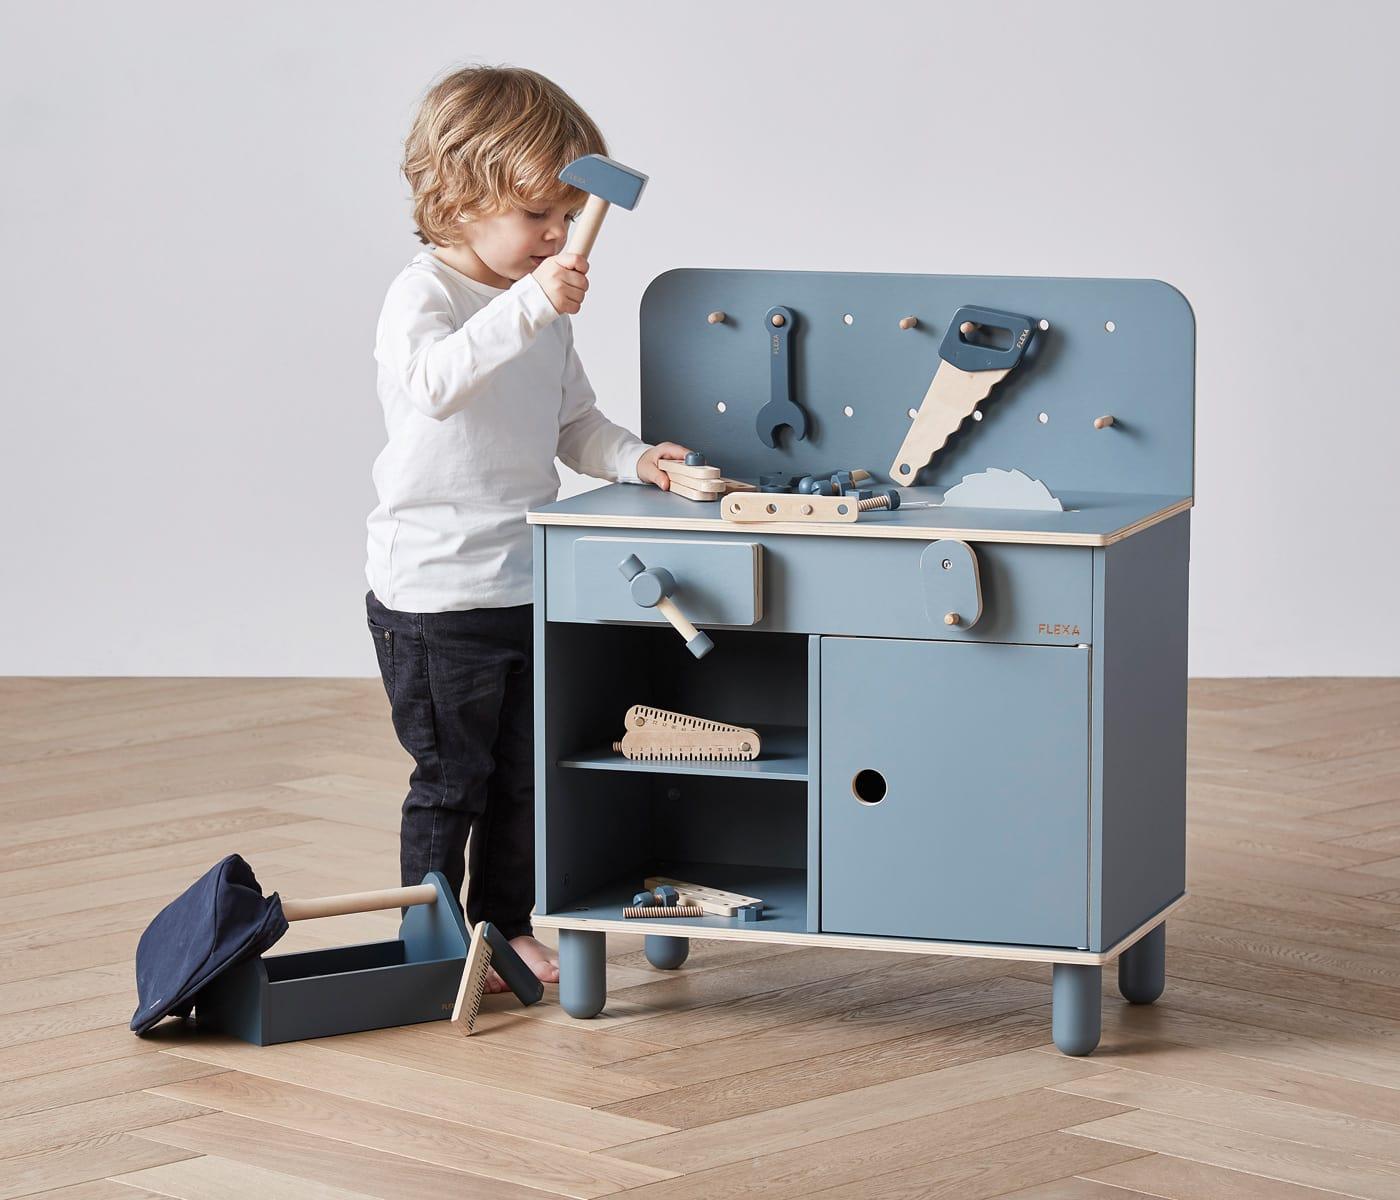 Lieblingssachen für Kinder: Holz-Werkbank // HIMBEER